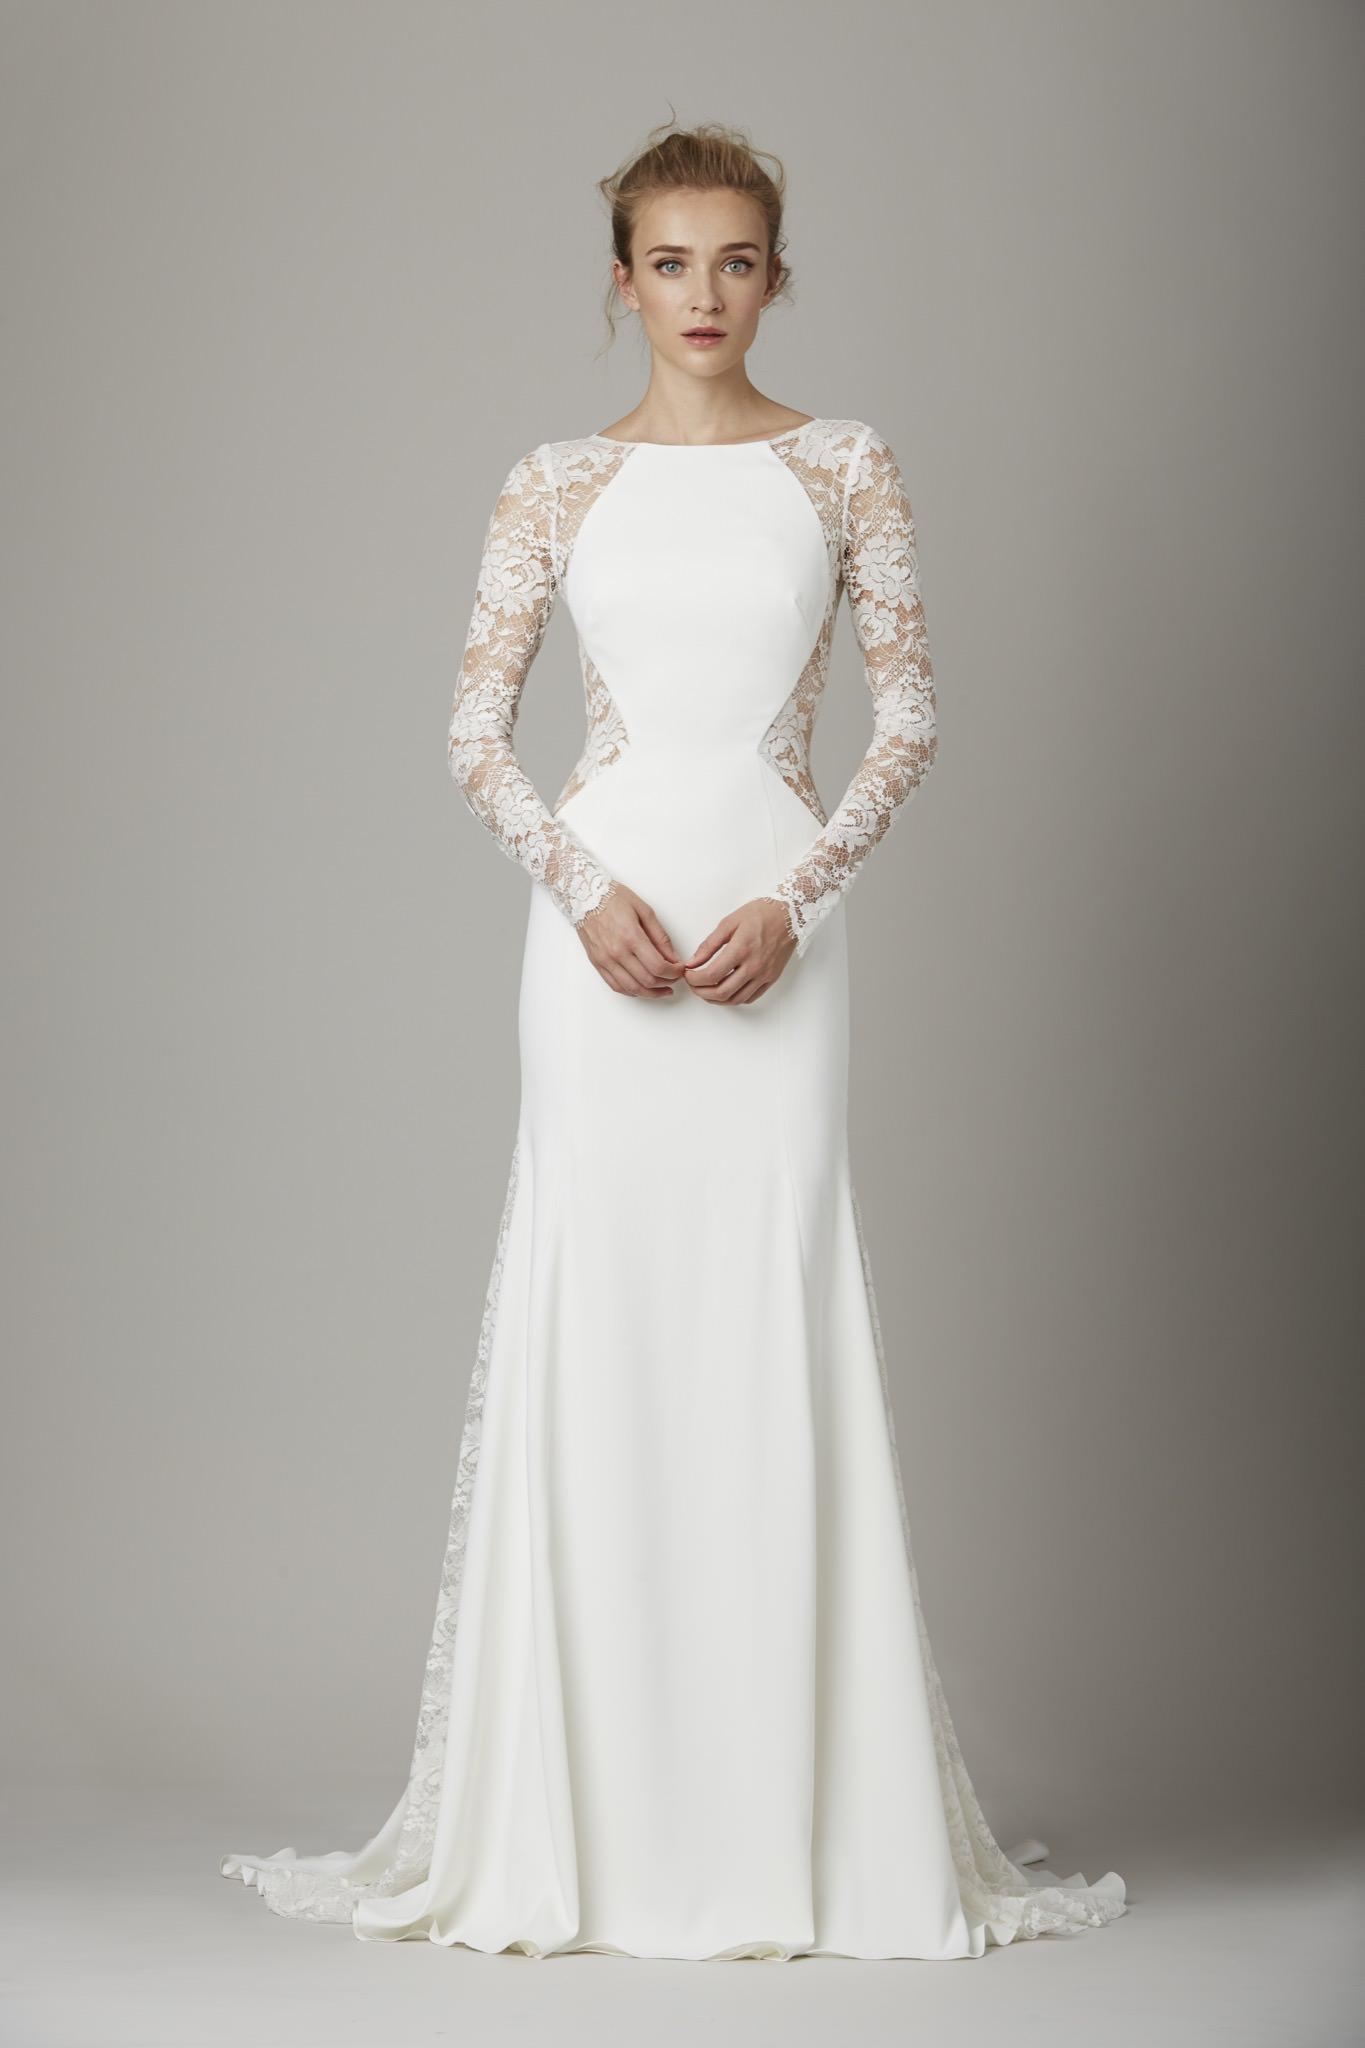 Lela Rose The Lounge wedding dress - Browns Bride